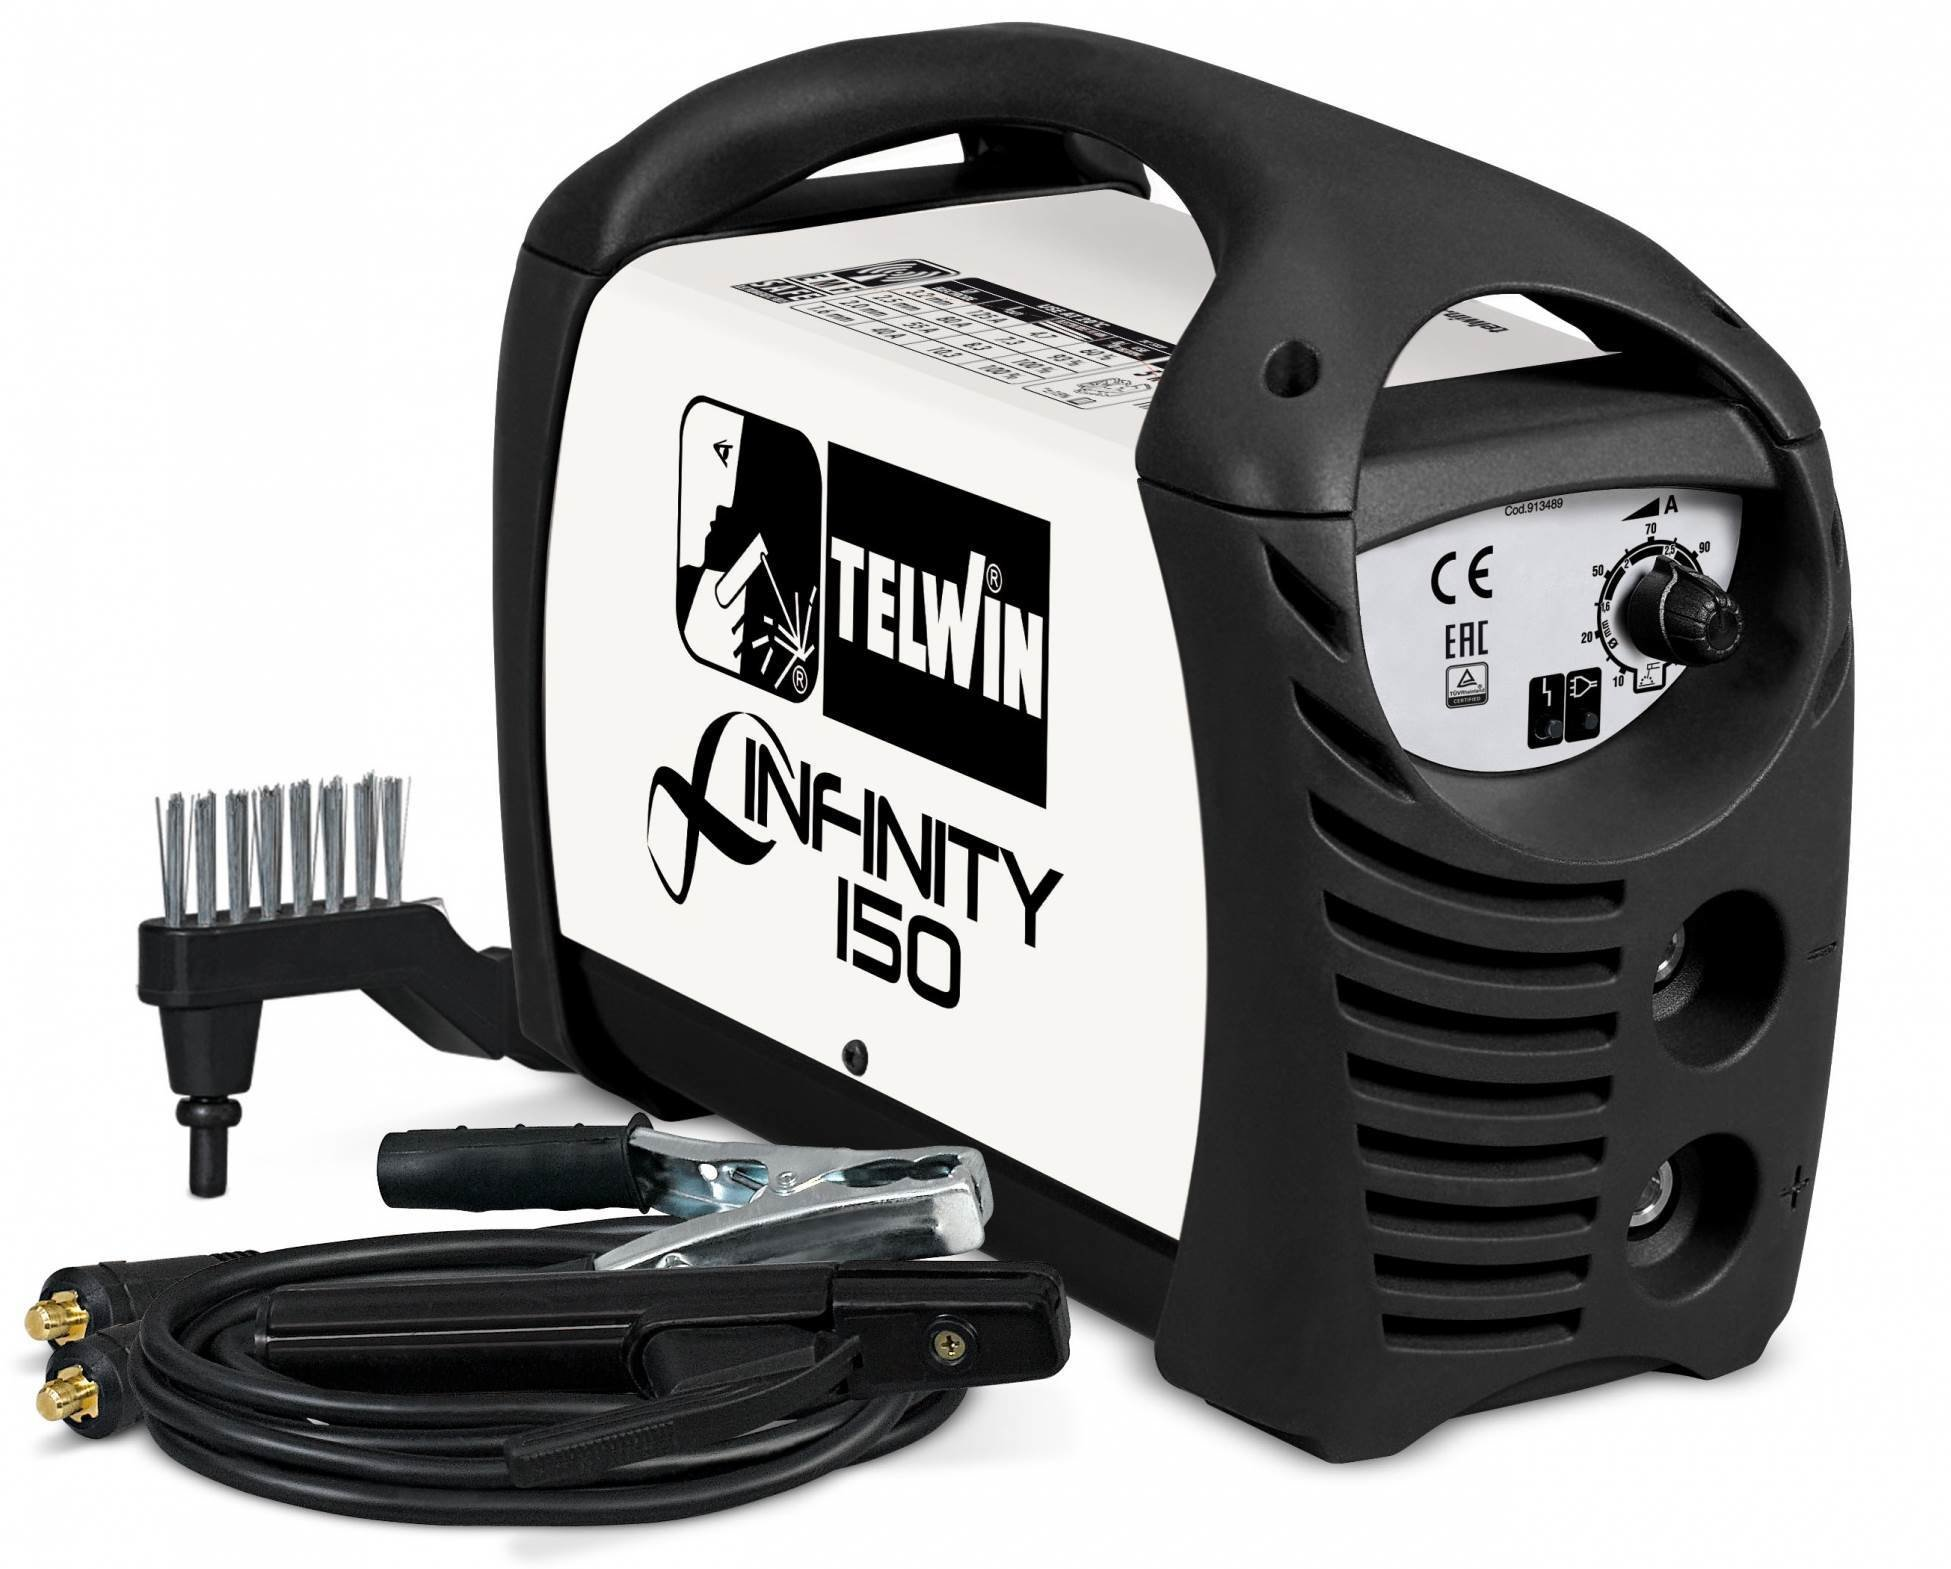 Сварочный аппарат Telwin INFINITY 150 ACD CARDBOARD CARRY 816079